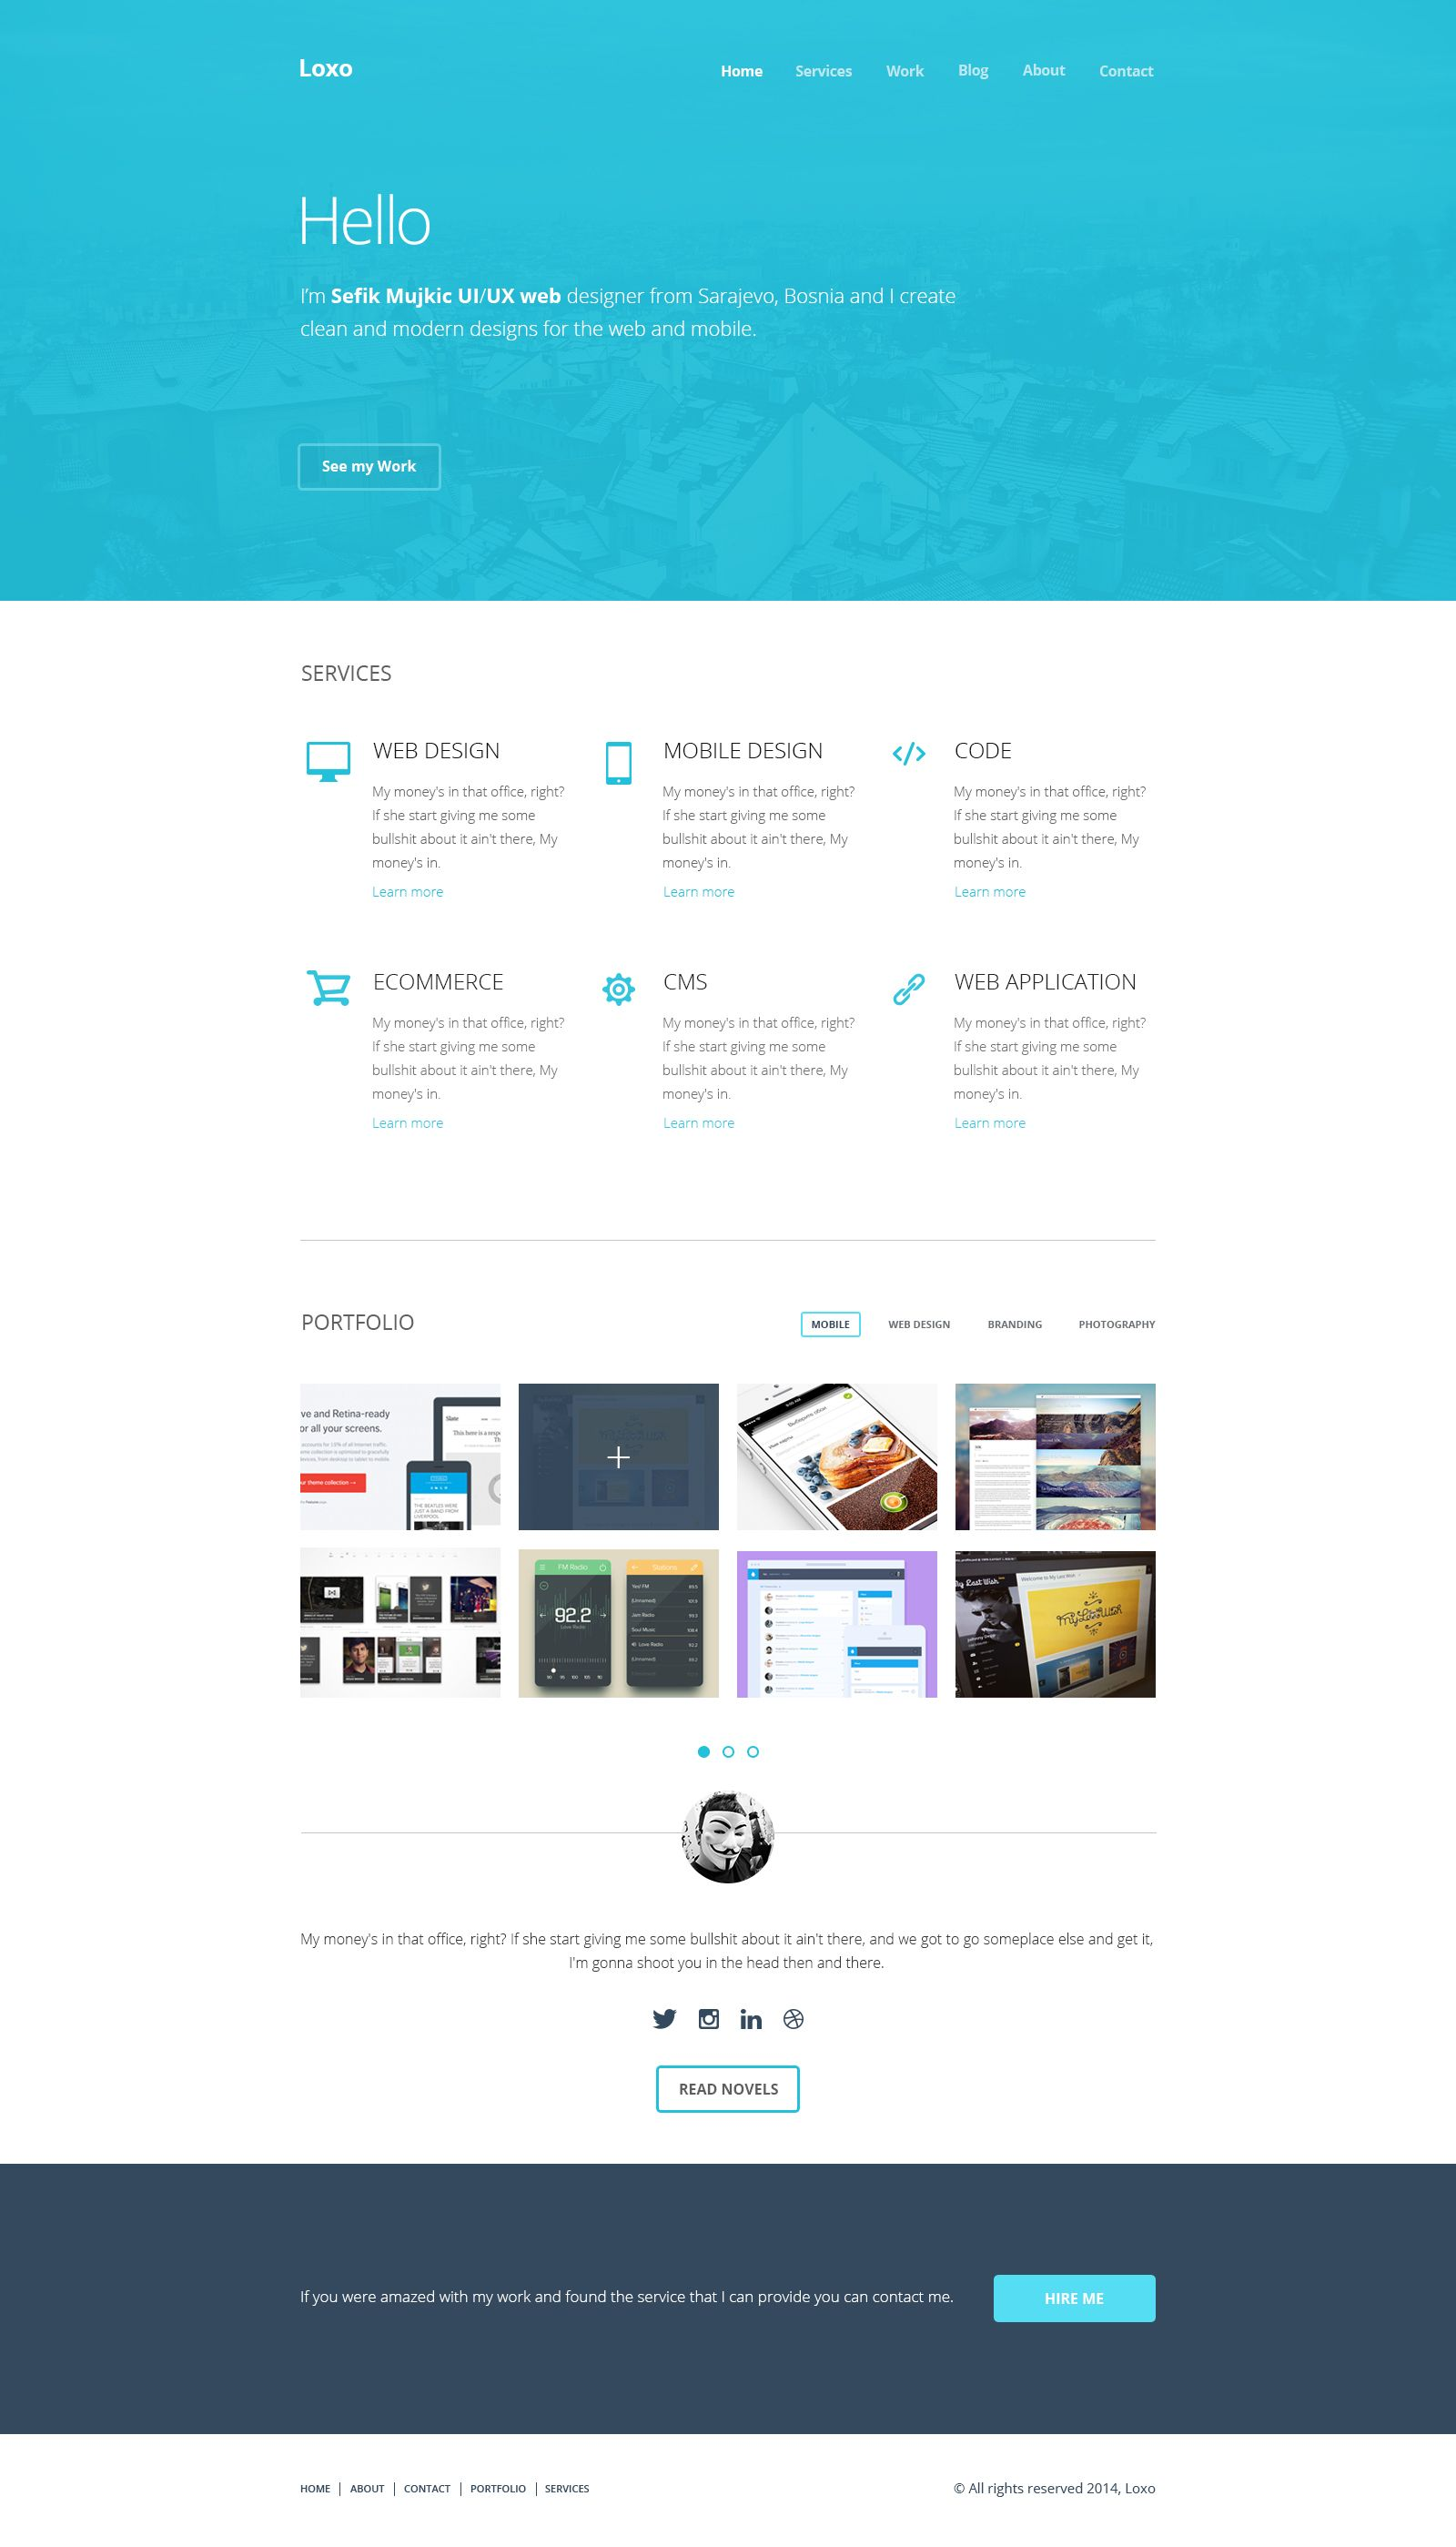 Real Pixels Jpg By Sefik Mujkic Web Design Web Design Gallery Portfolio Web Design